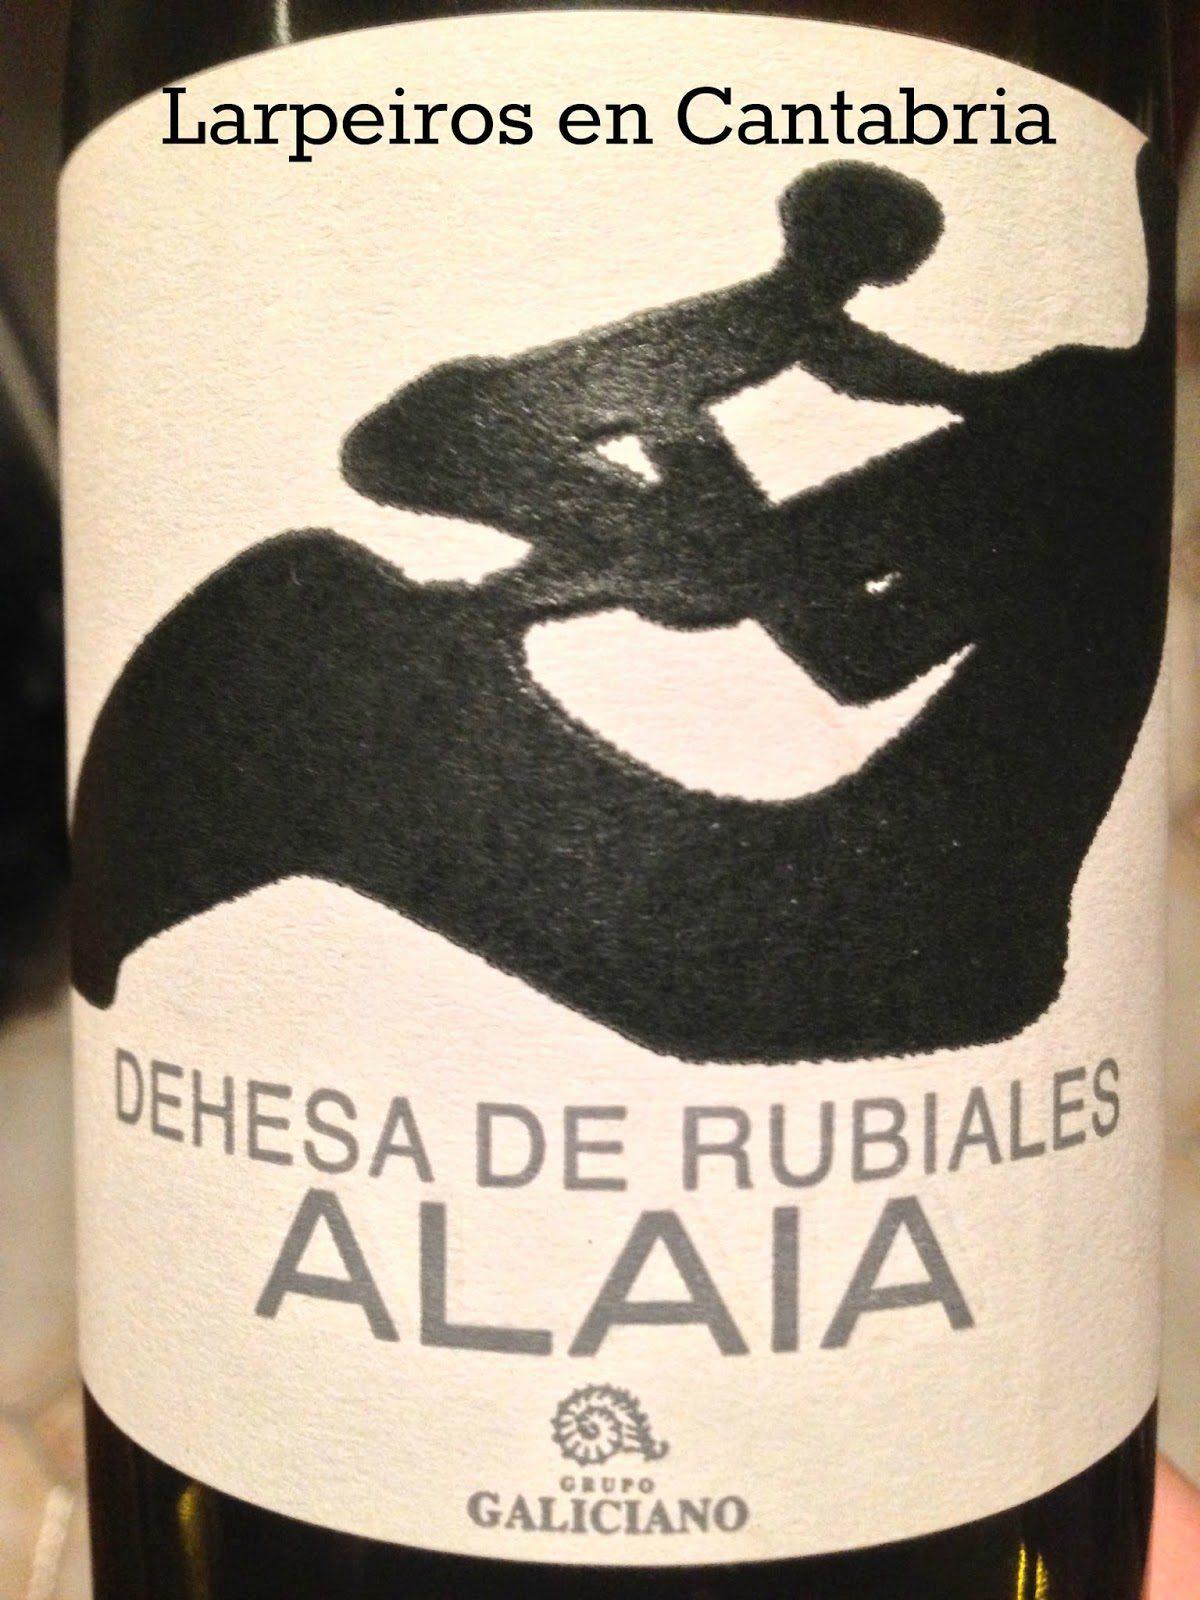 Vino Tinto Alaia 2005 Dehesa de Rubiales: Increíble